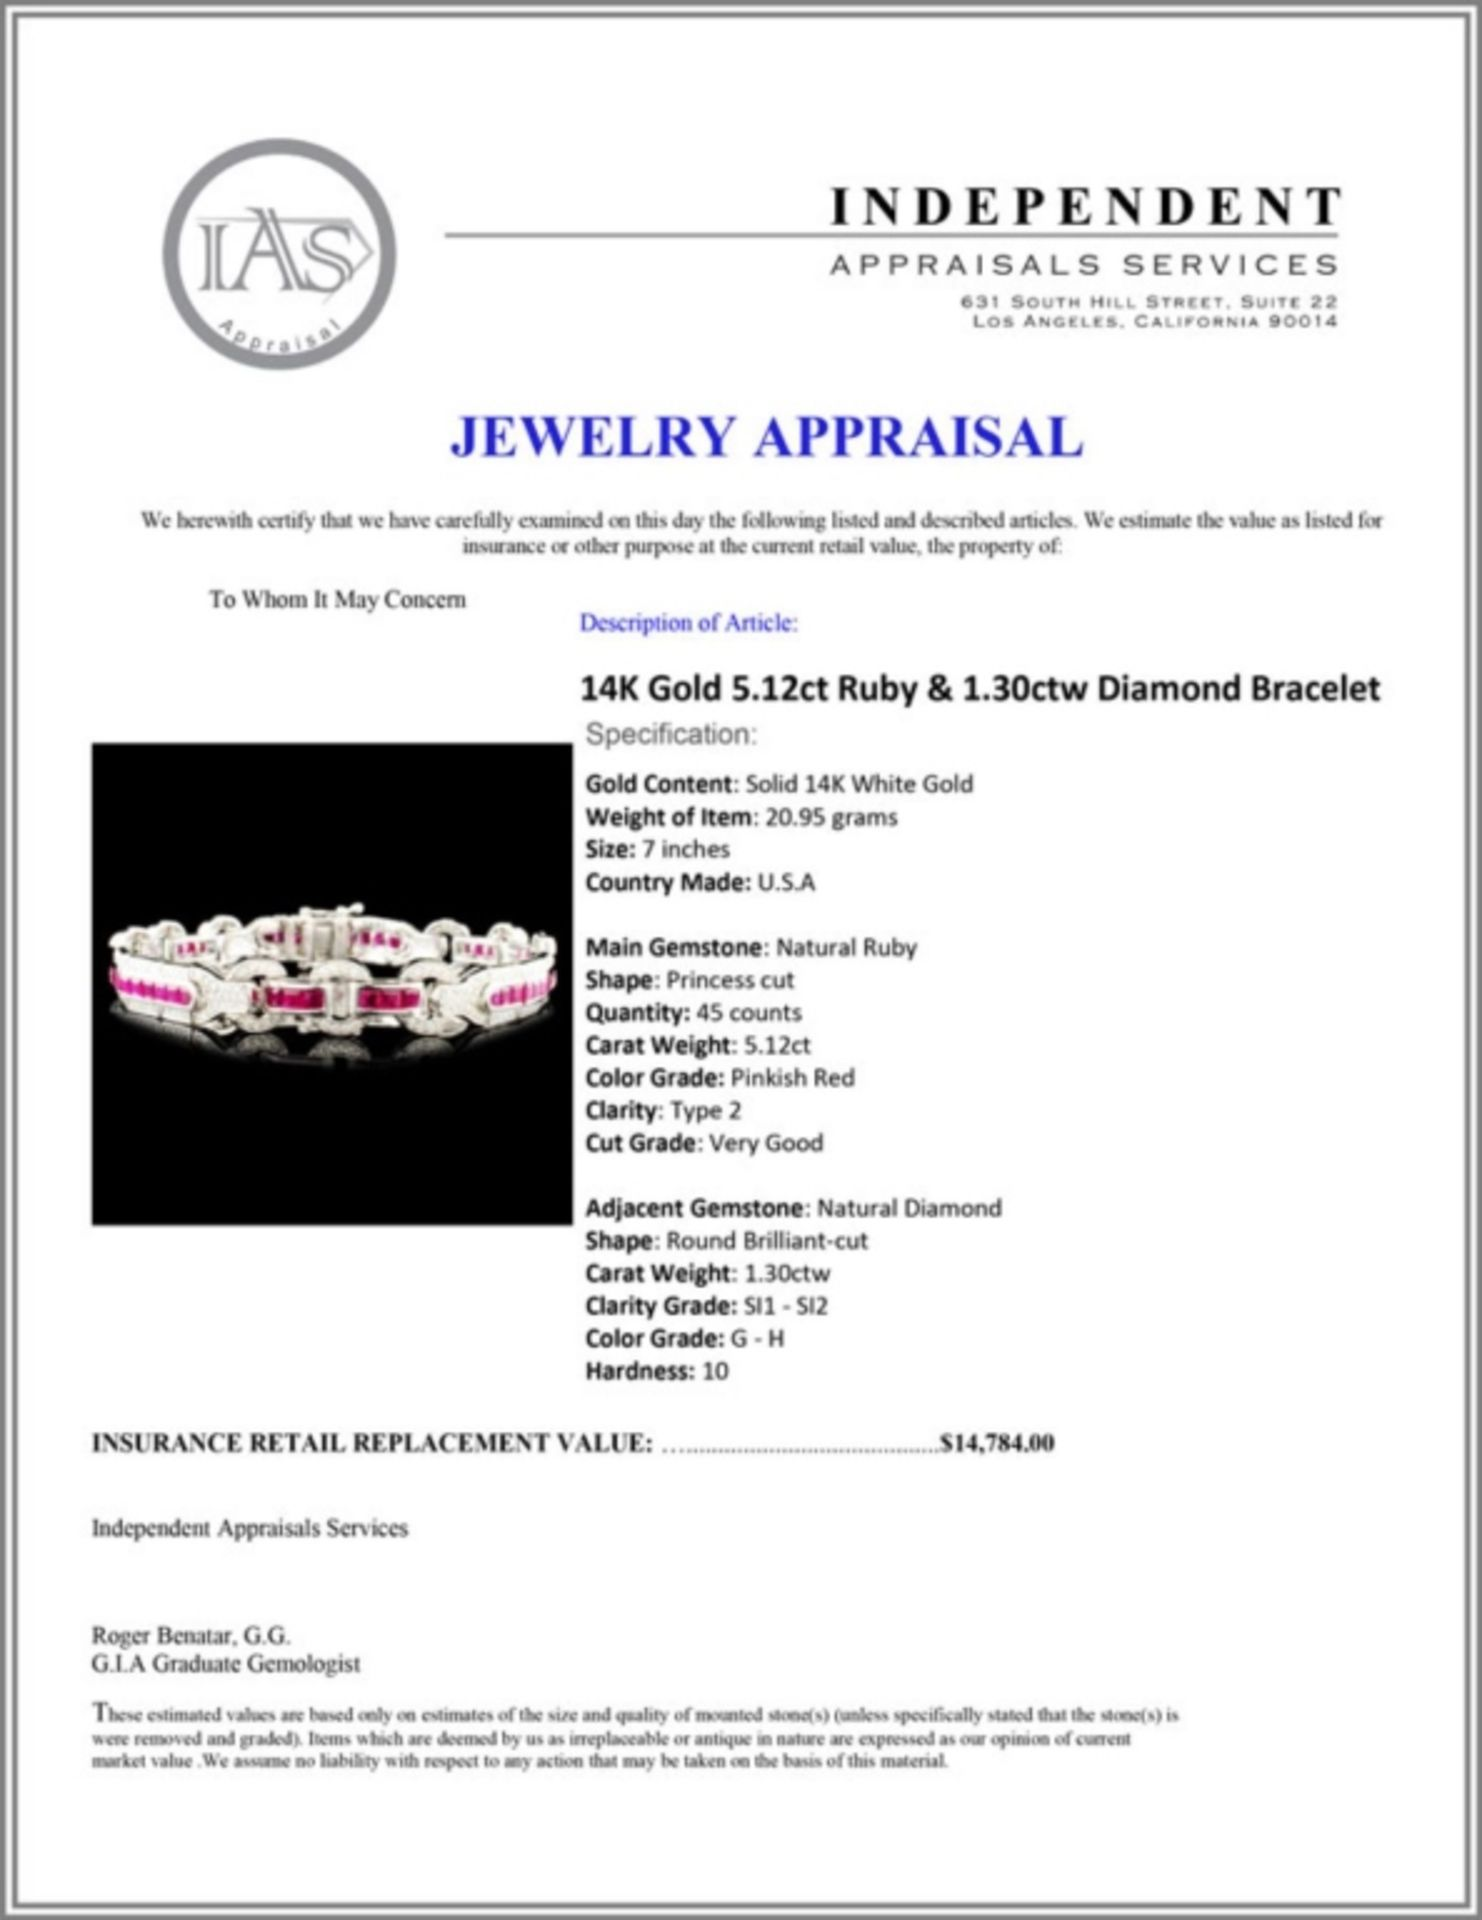 14K Gold 5.12ct Ruby & 1.30ctw Diamond Bracelet - Image 4 of 4